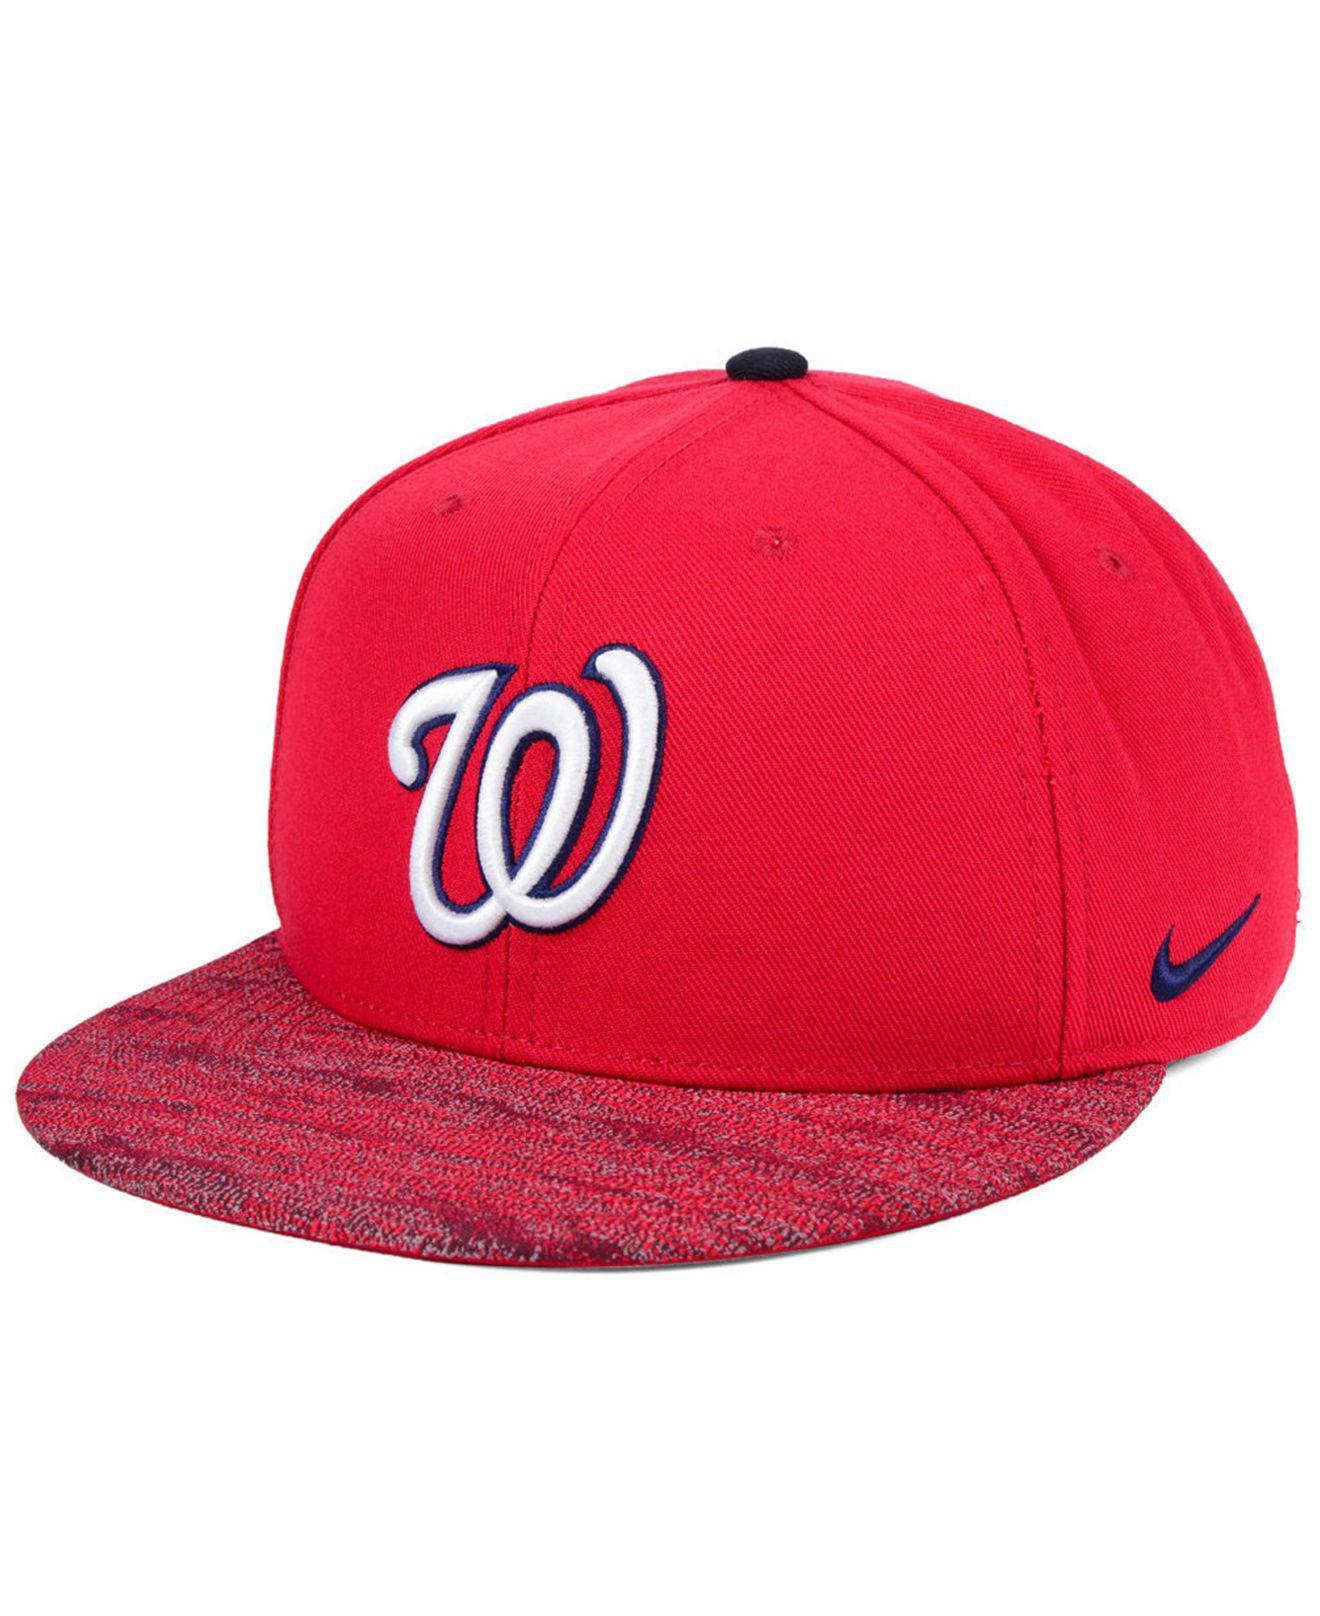 hot sales d913d c55a3 Nike. Men s Red Washington Nationals Reverse New Day Snapback Cap